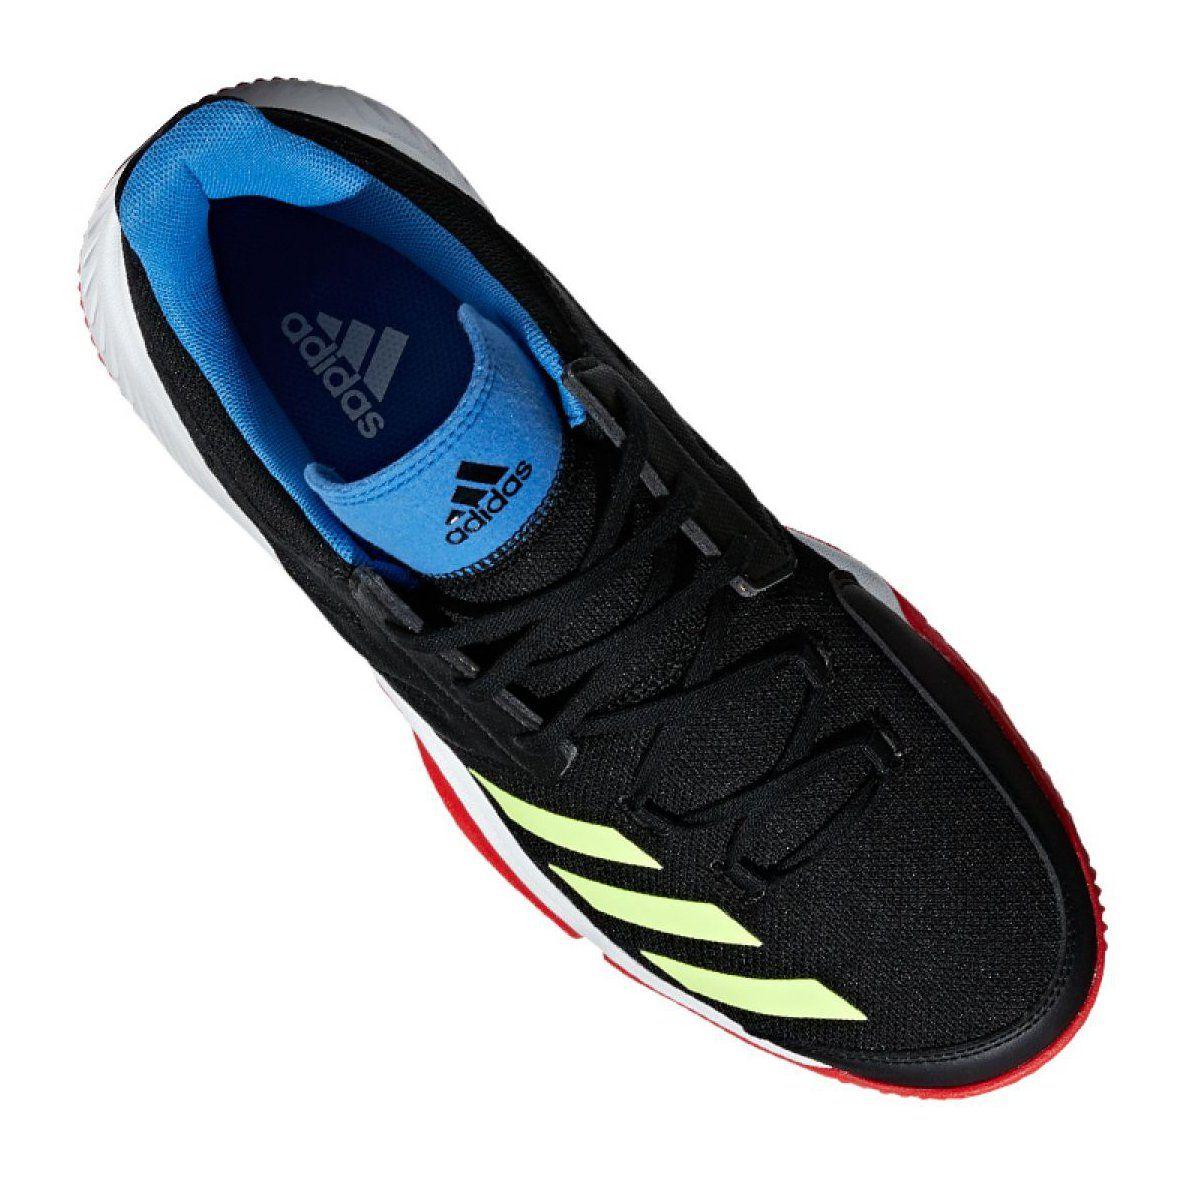 Adidas Essence 406 M Bd7406 Shoes Black Multicolored Black Shoes Shoes Adidas